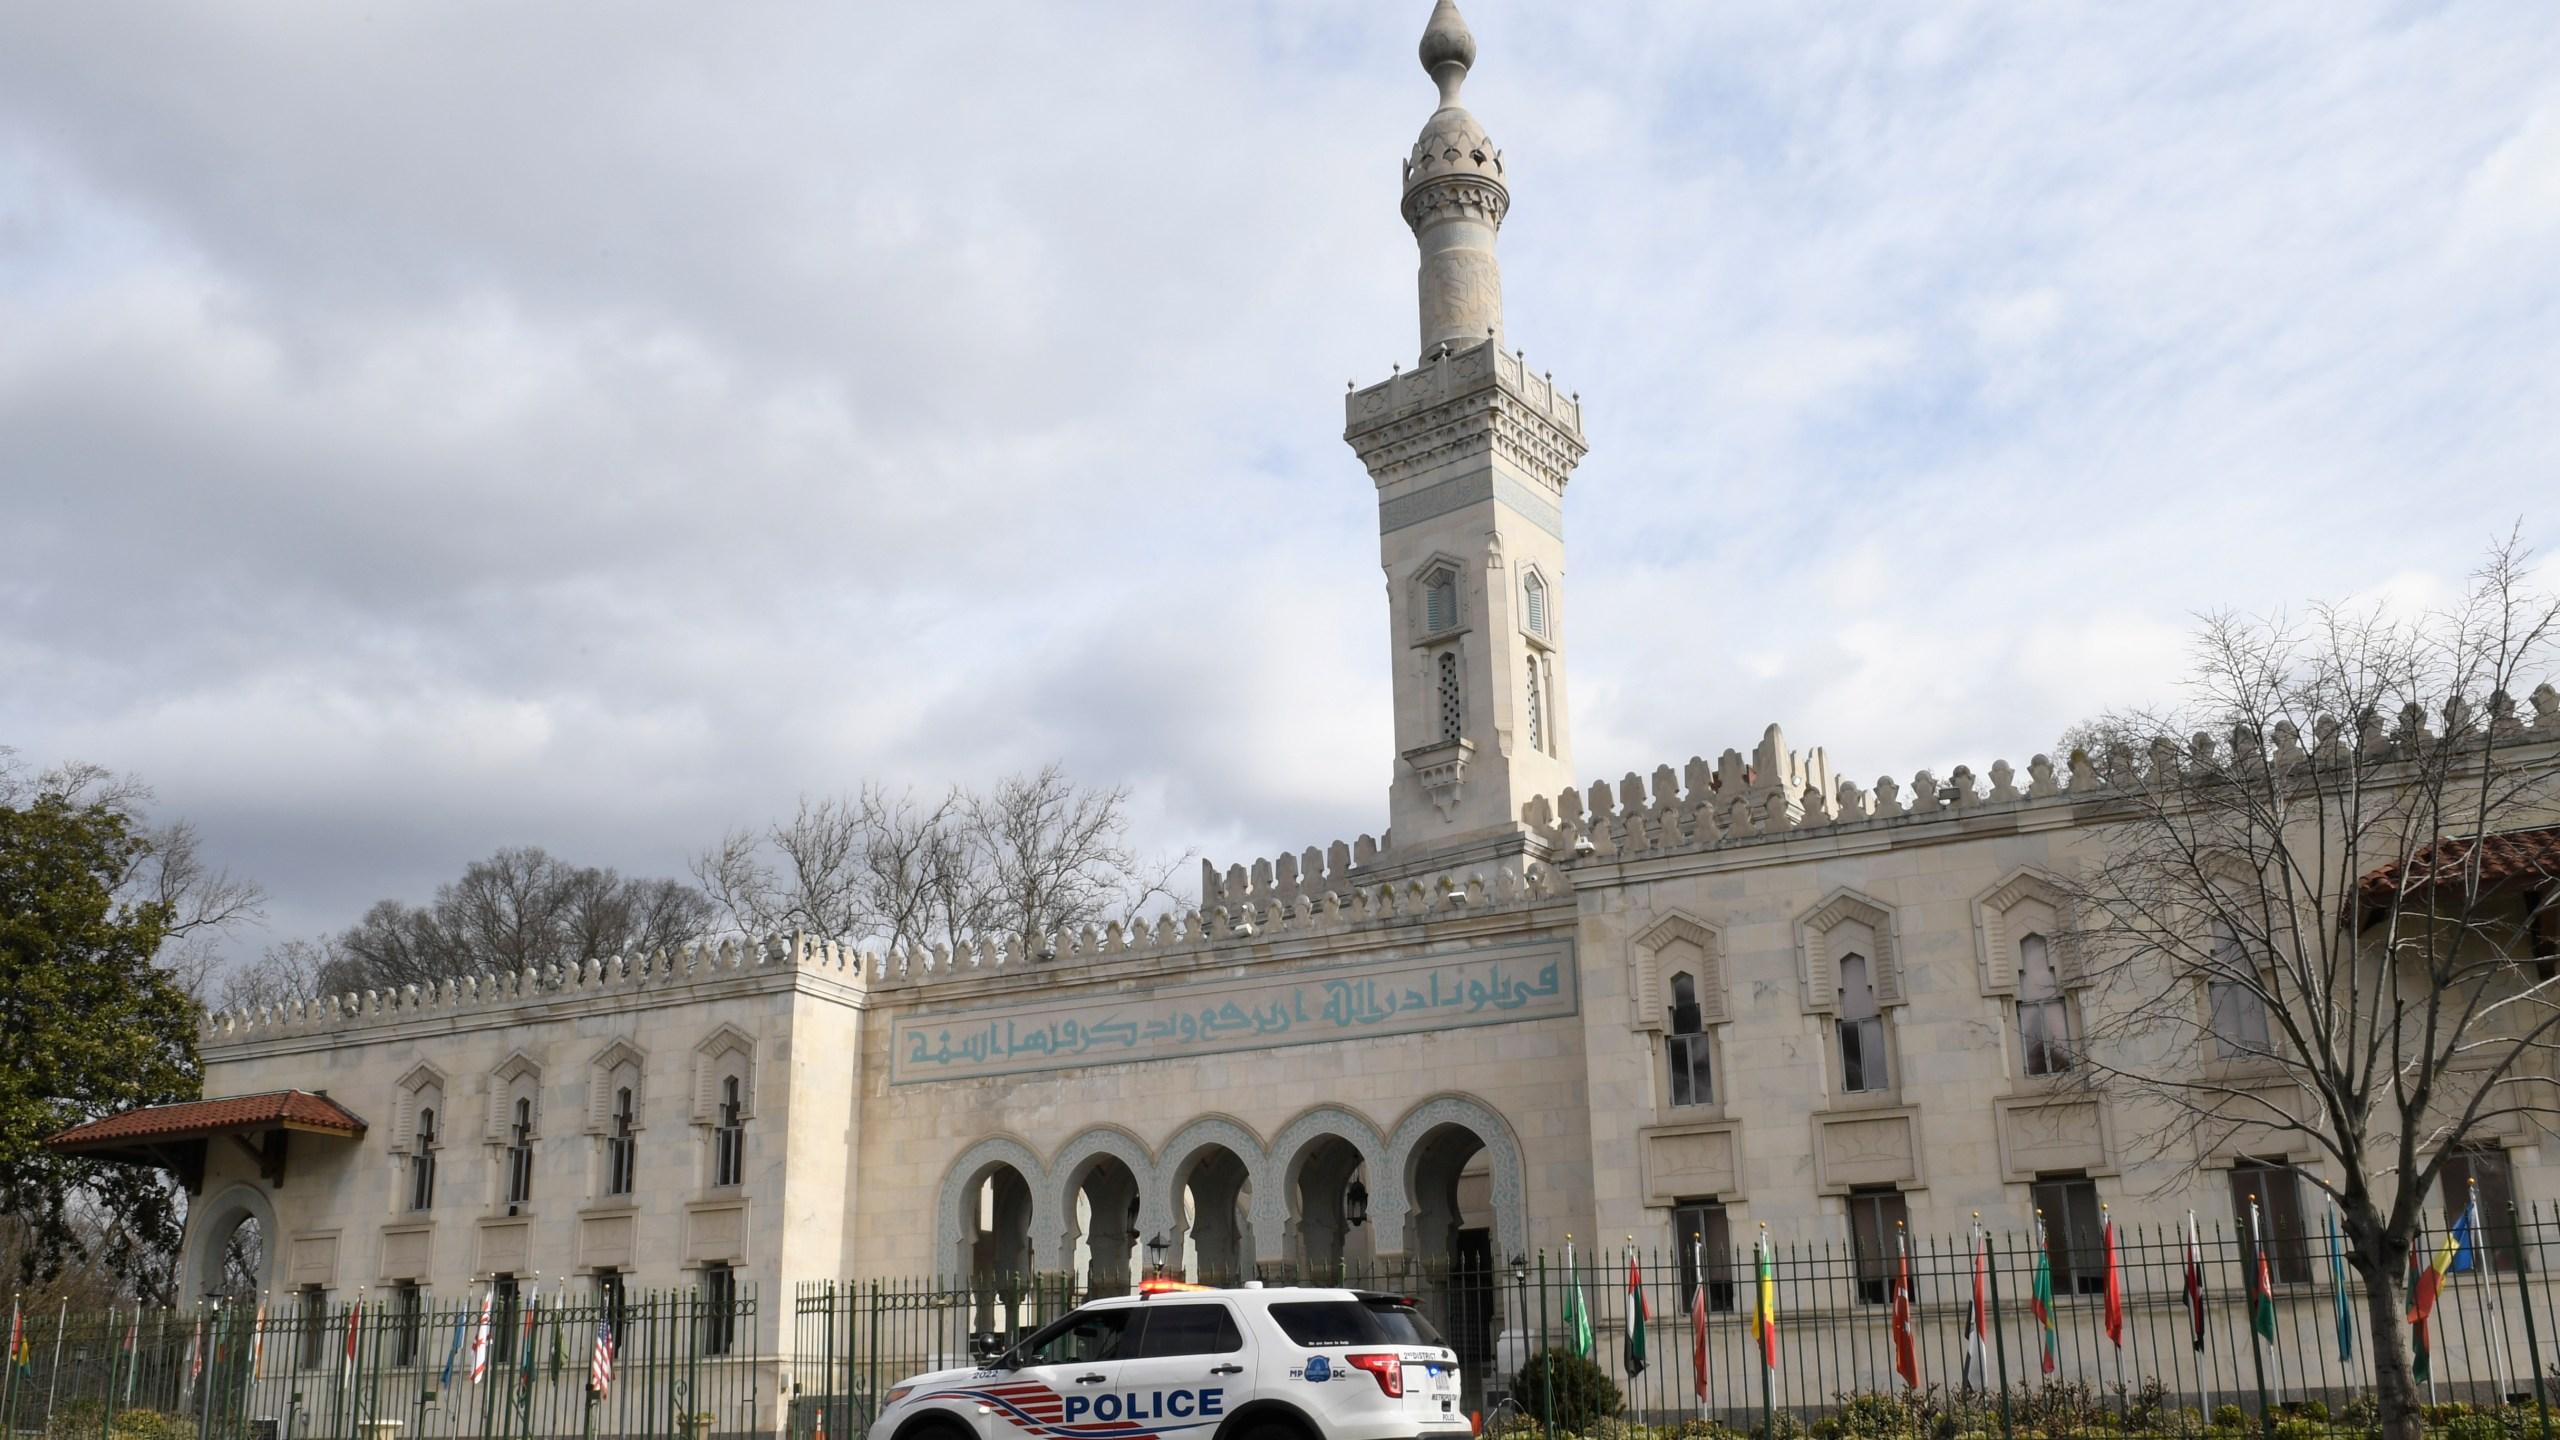 New_Zealand_Mosque_Shootings_Washington_25800-159532.jpg00639299